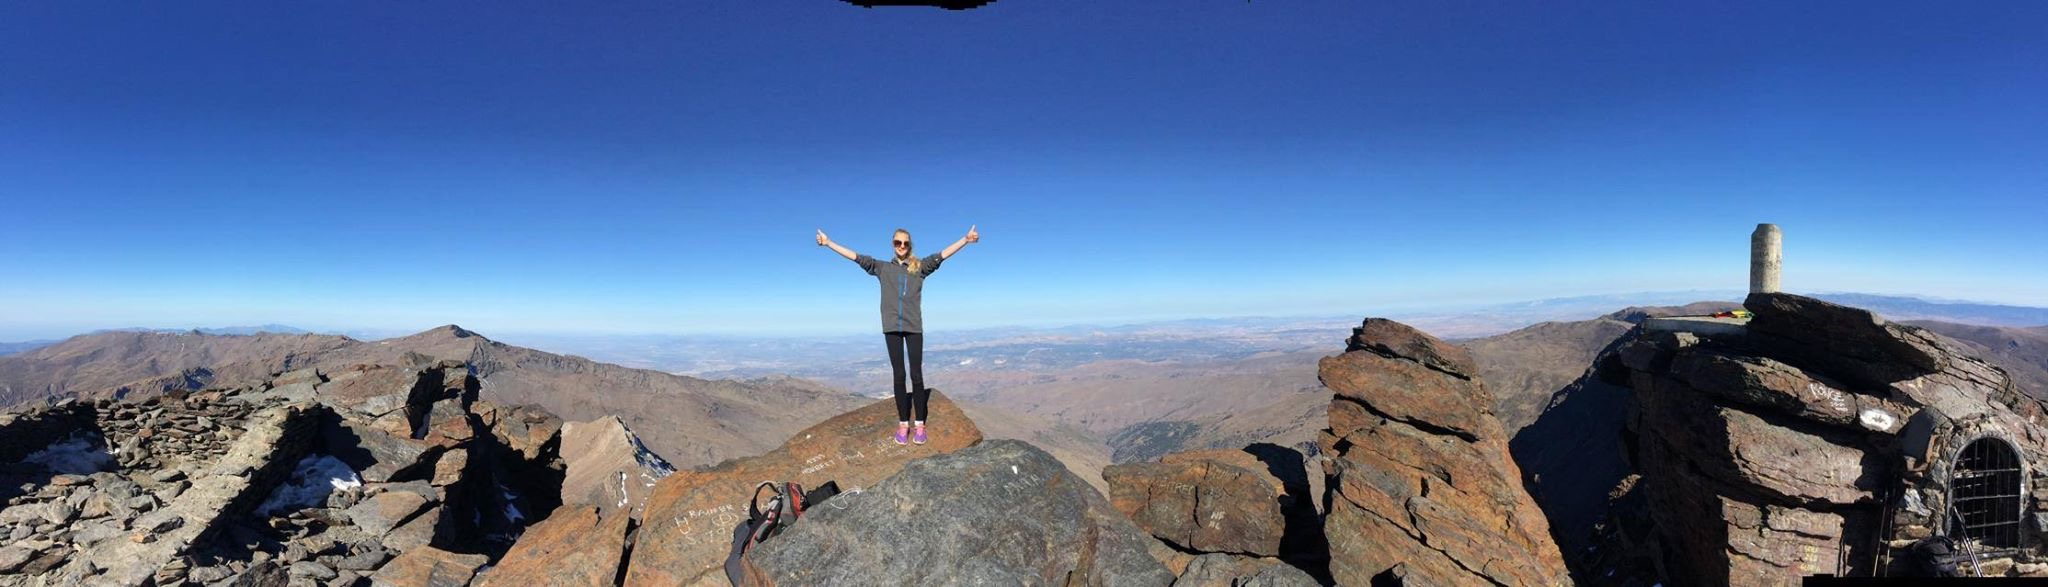 Rock Climbing in the Picos